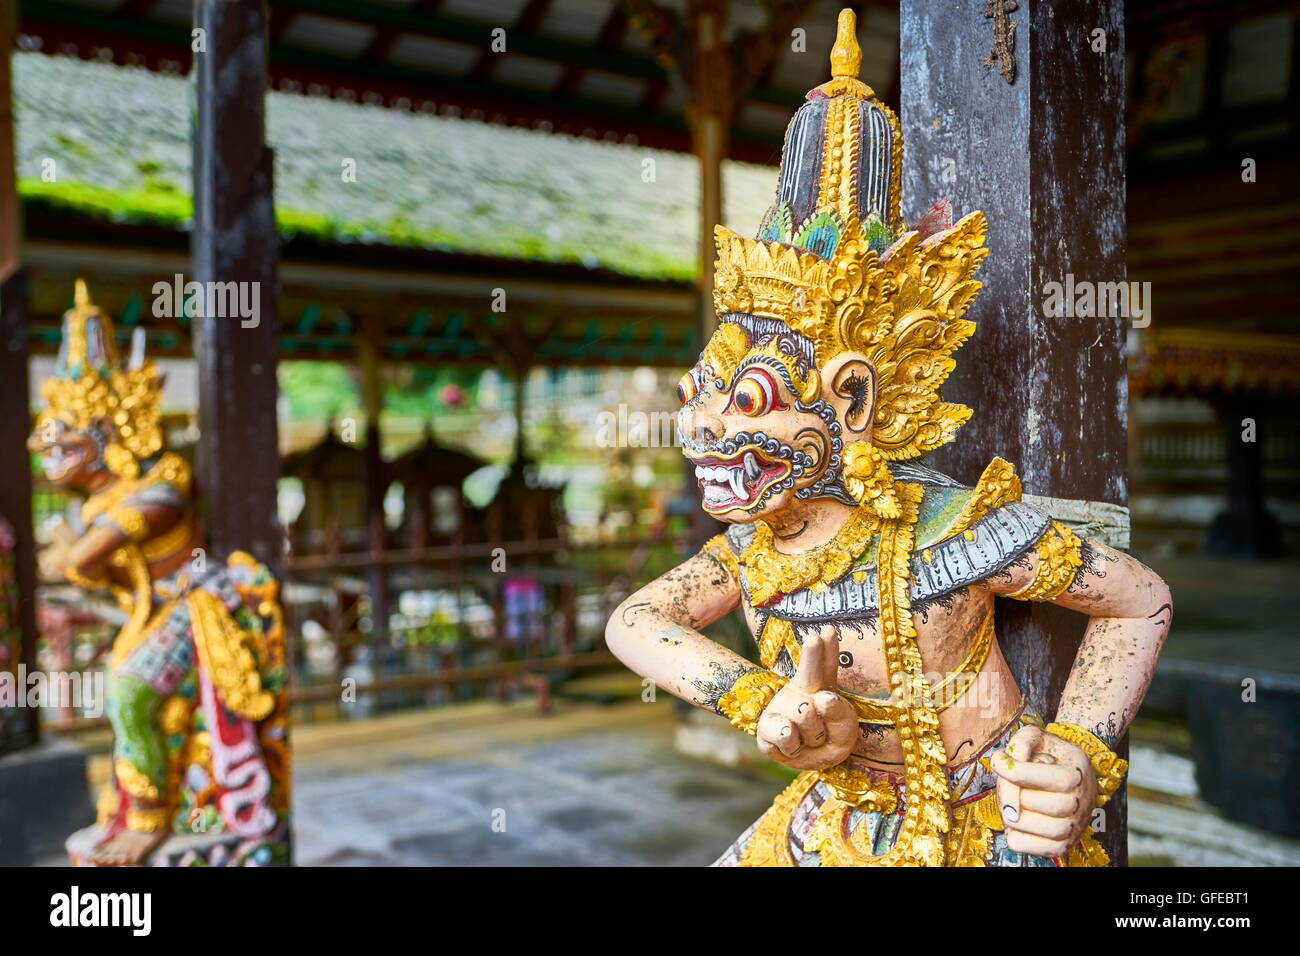 Statue de Dieu à Pura Gunung Kawi Temple, Bali, Indonésie Photo Stock